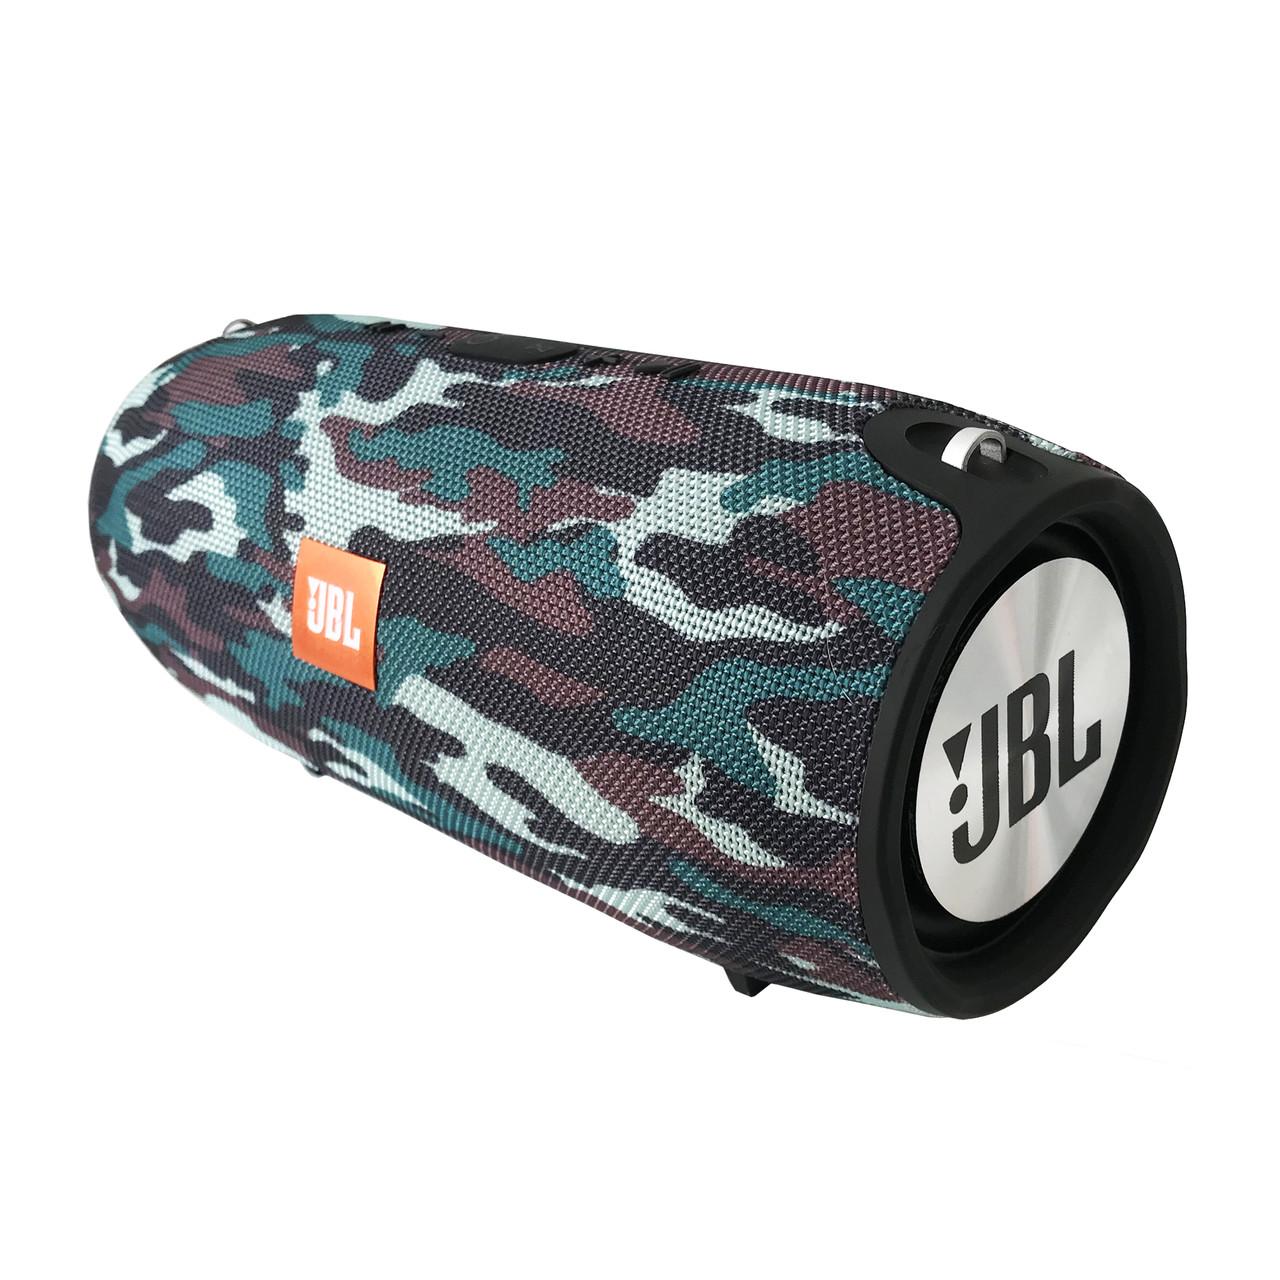 0f8db3c39 Беспроводная водонепроницаемая экстрим колонка JBL Xtreme Army -